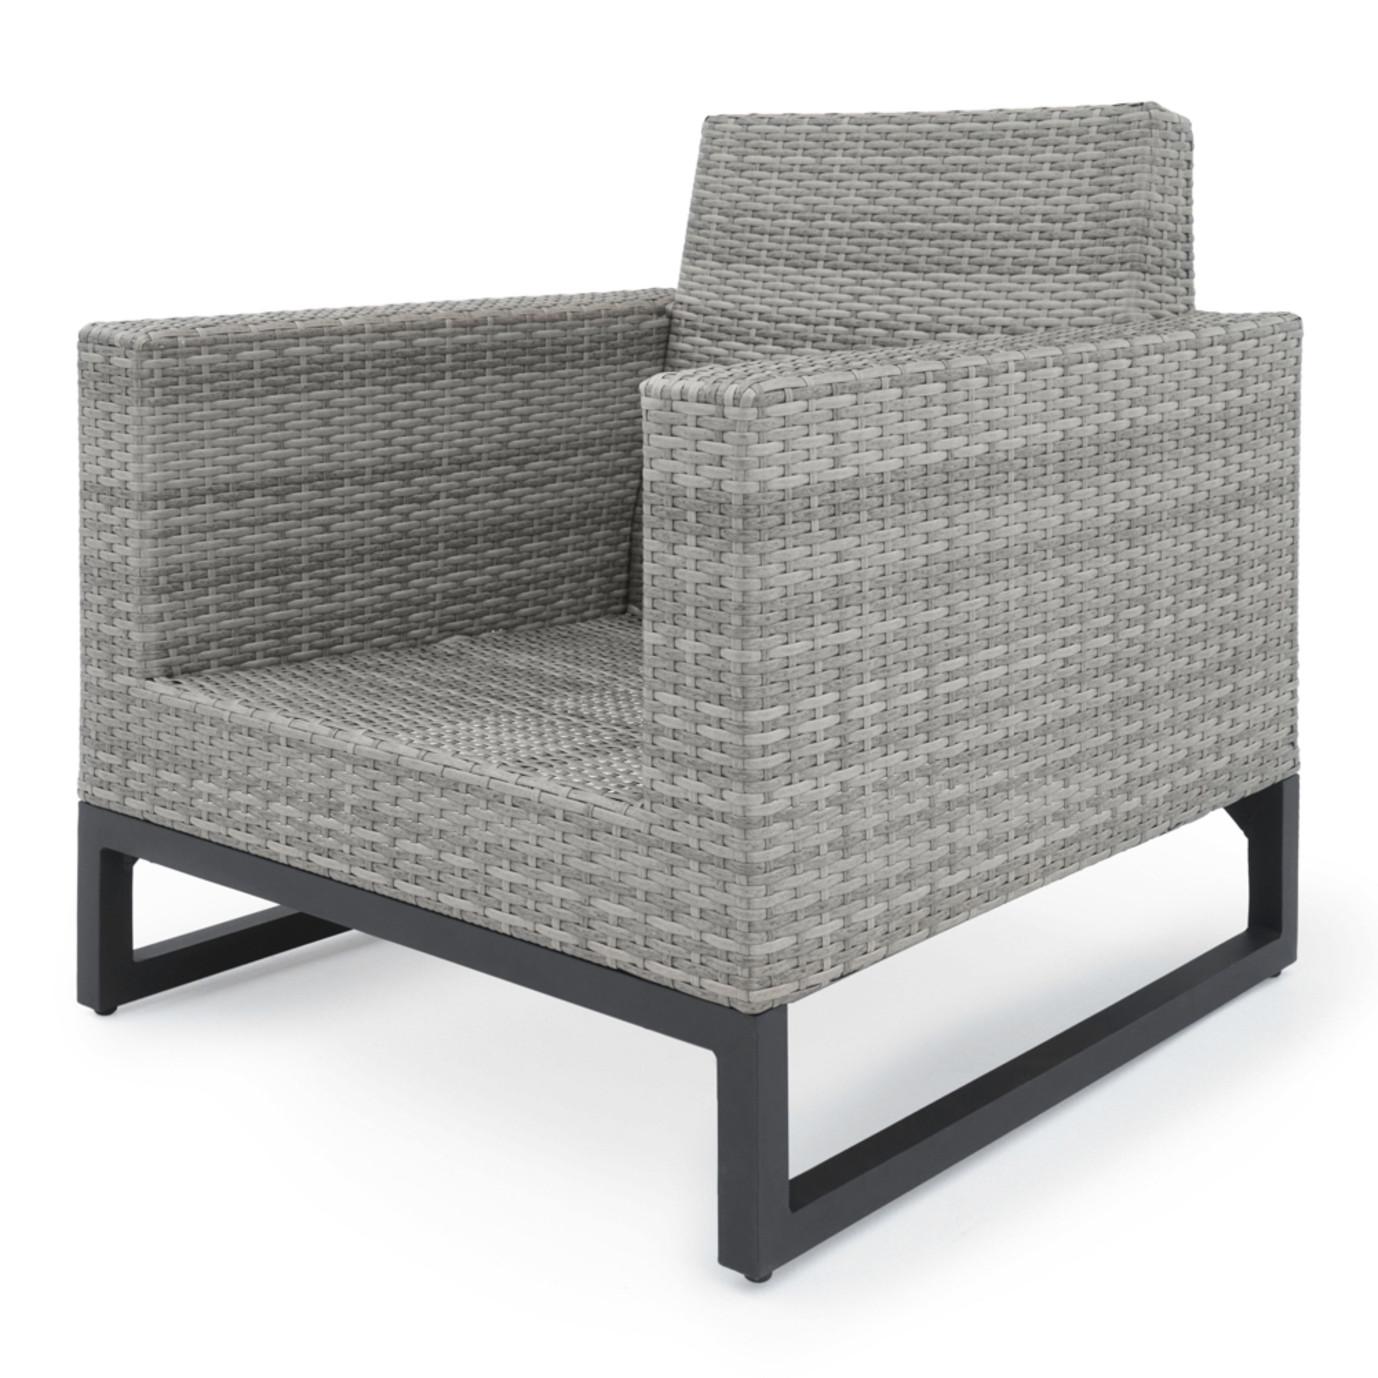 Milo™ Gray Club Chairs - Spa Blue